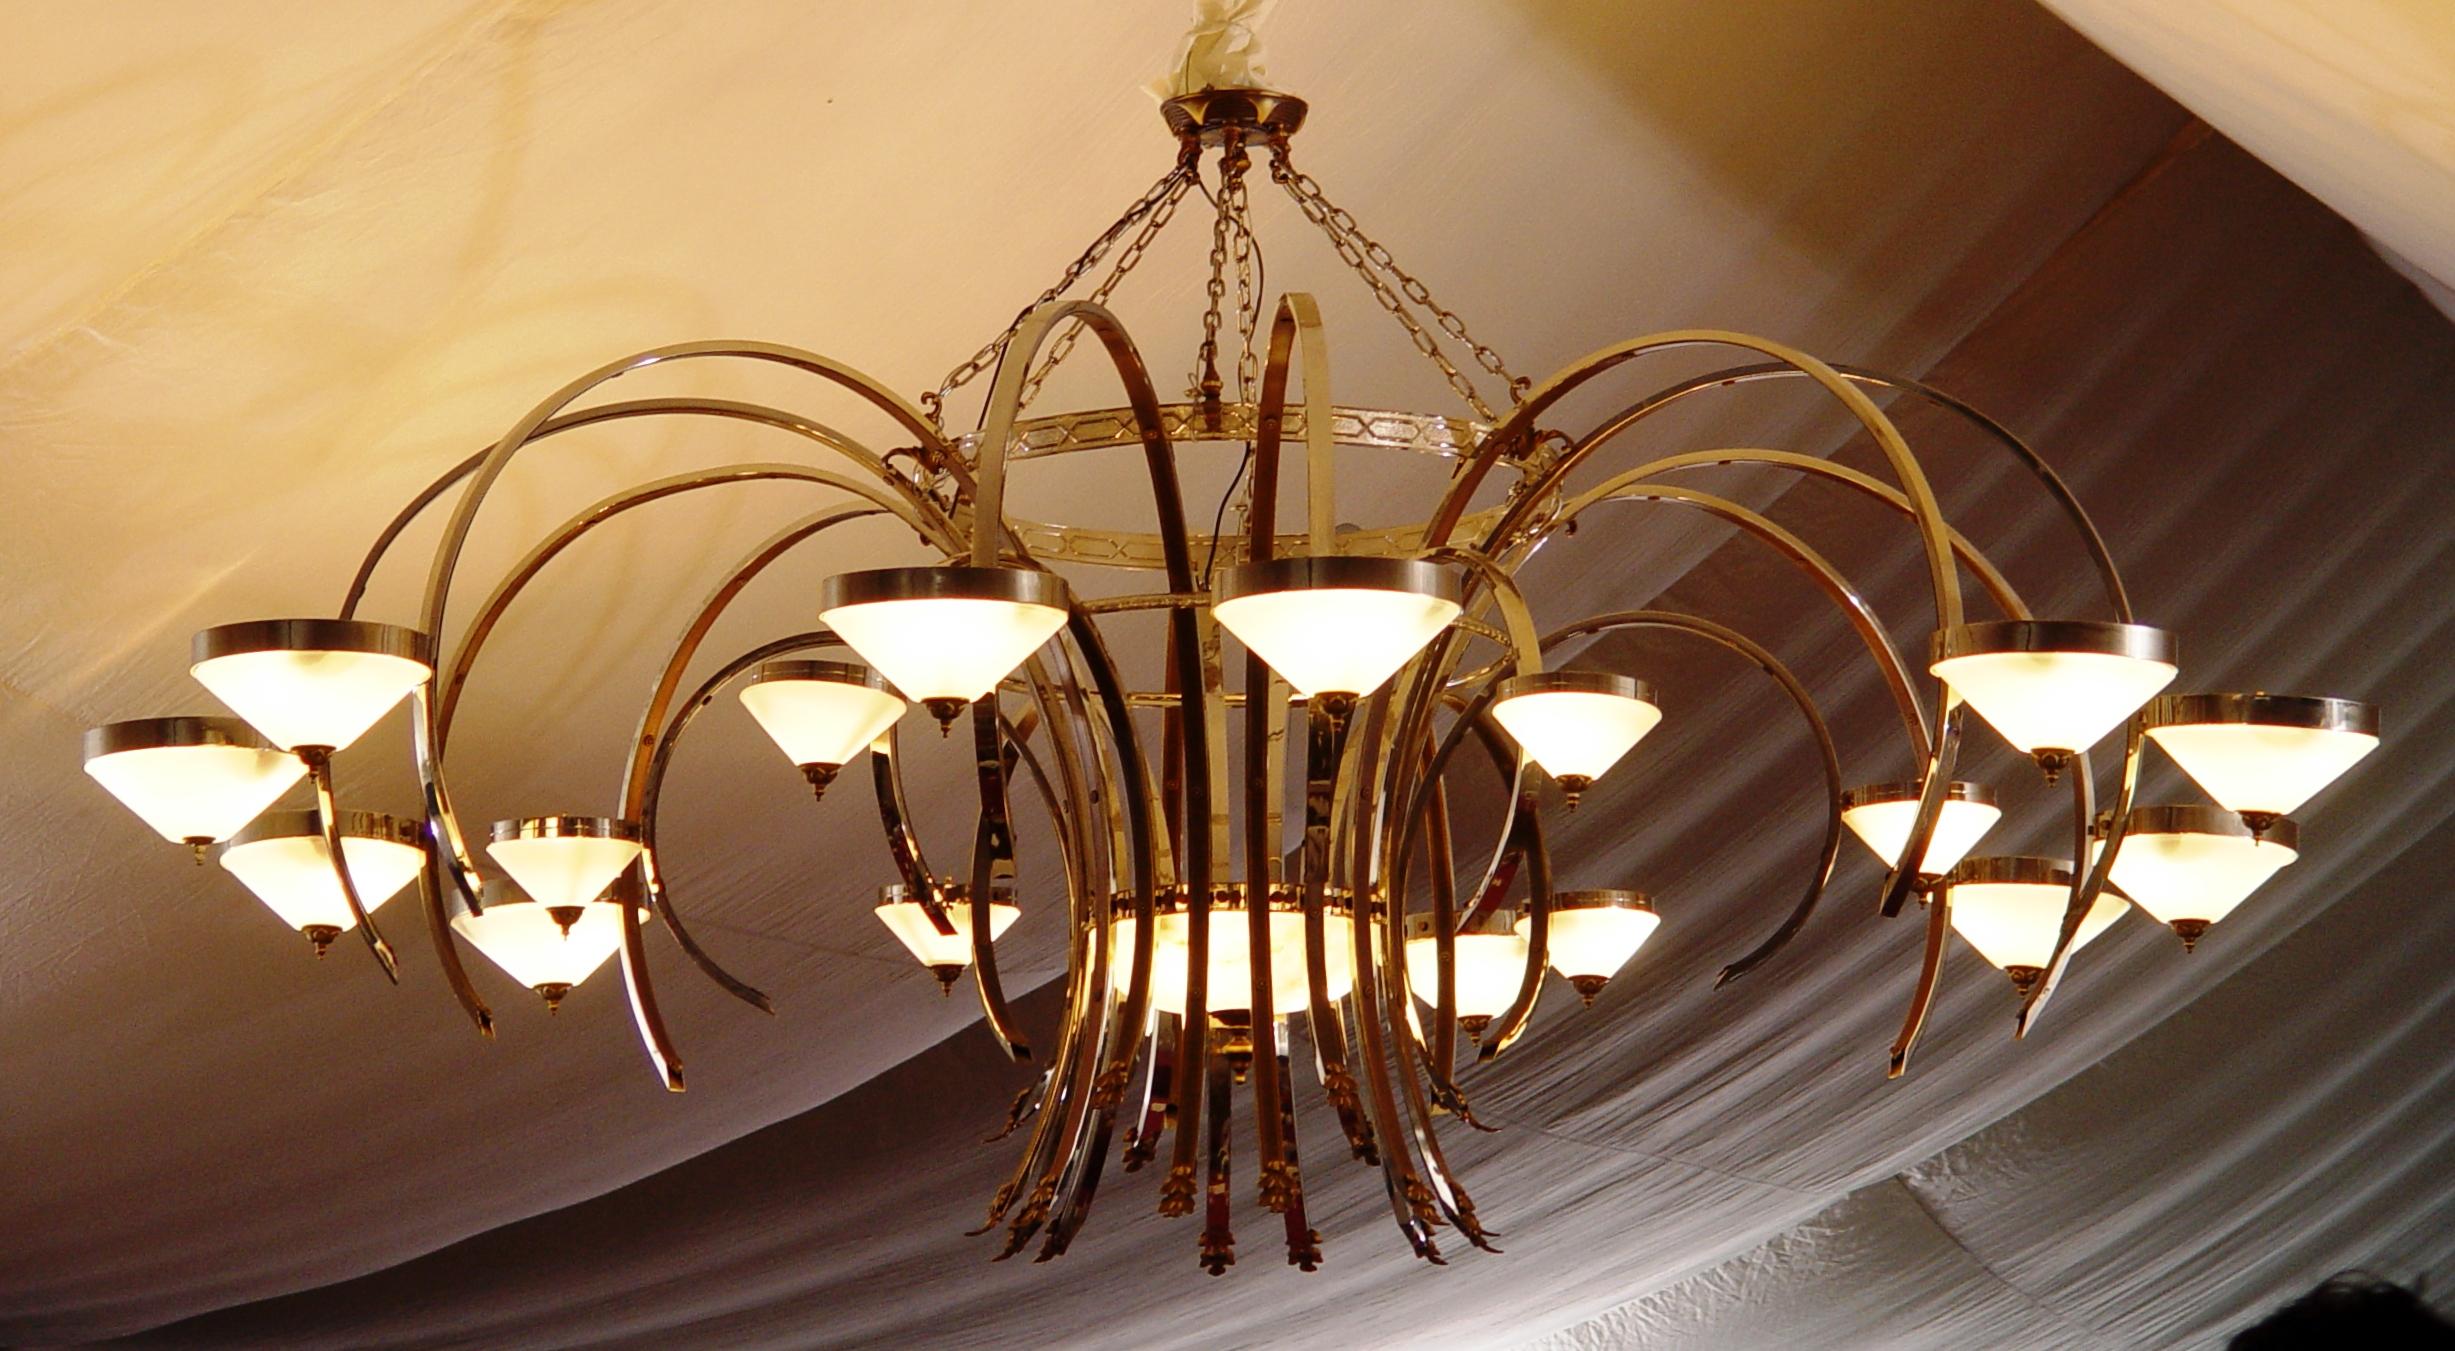 Lamparas falc fabrica de lamparas proyectos 4 - Fabricantes de lamparas en valencia ...